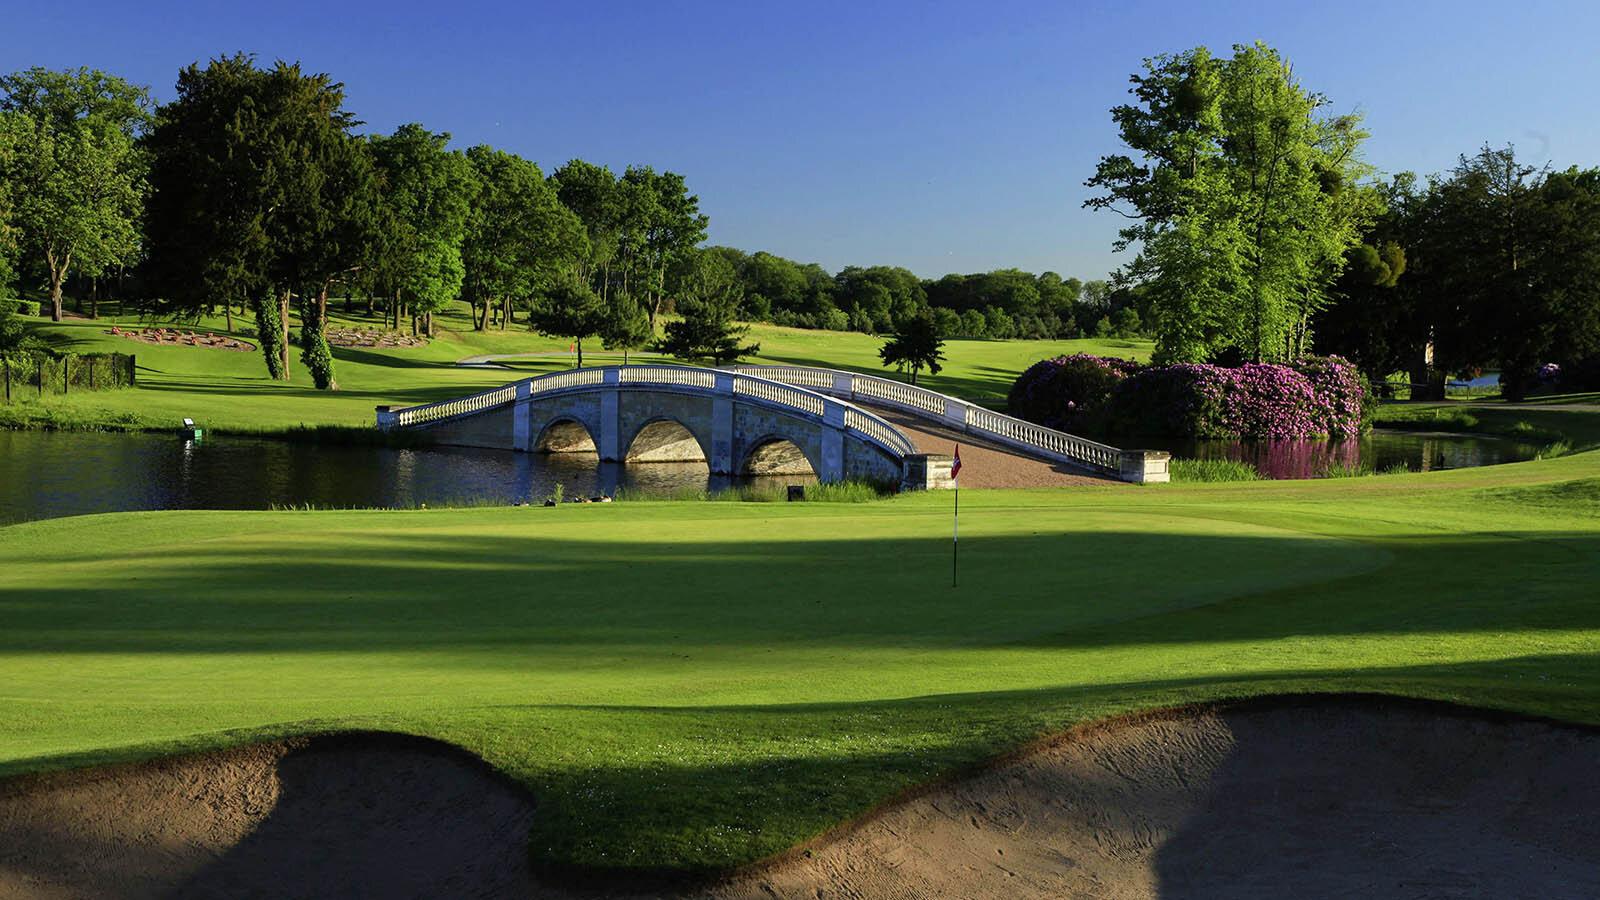 stoke_park_golf_club_3.jpg